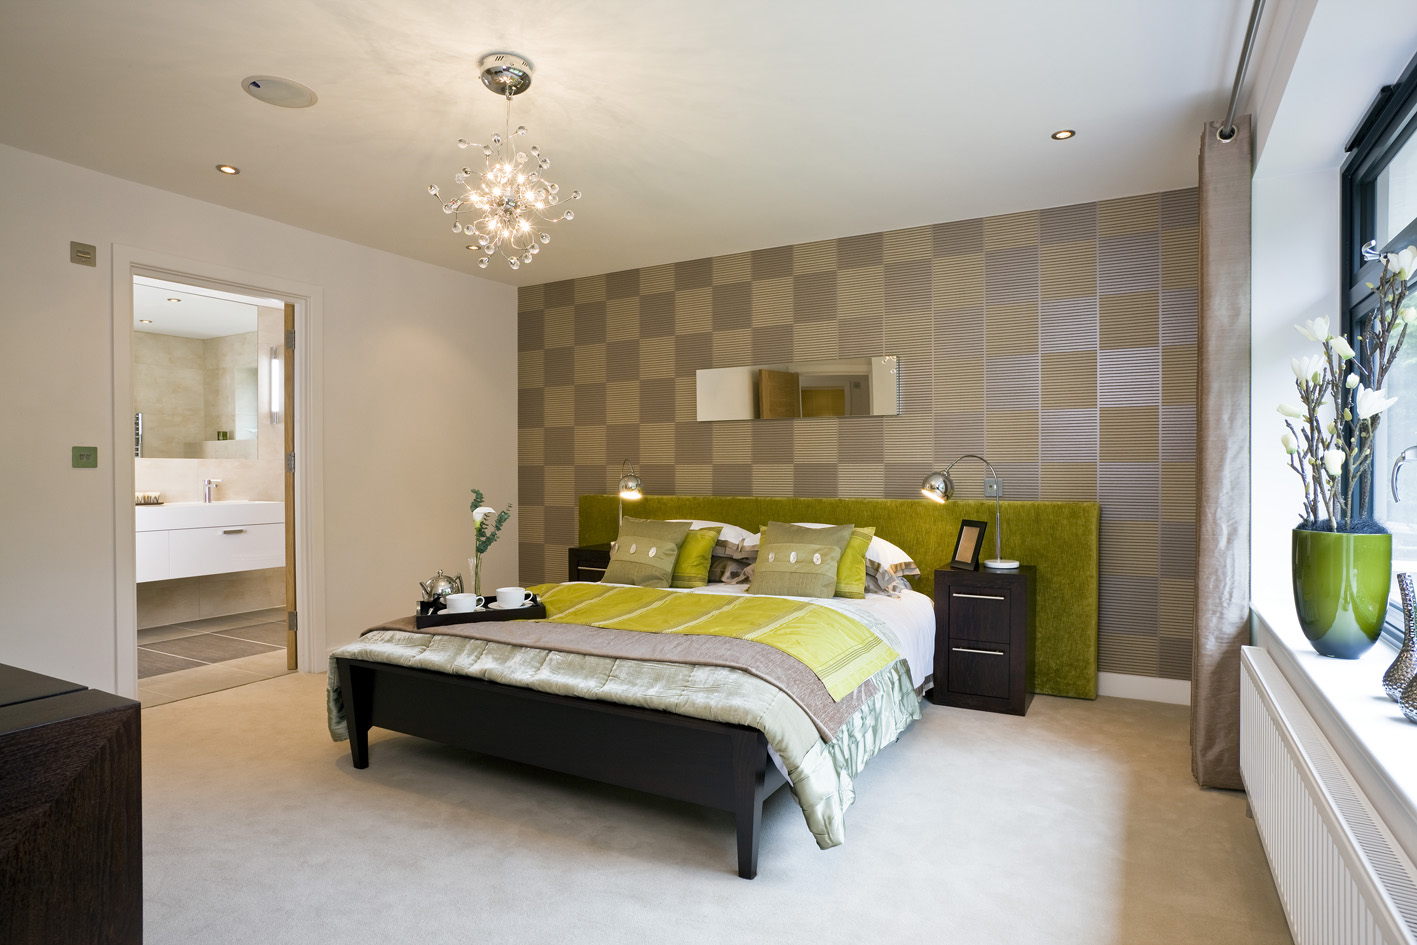 Bedroom Set of Furniture in Black